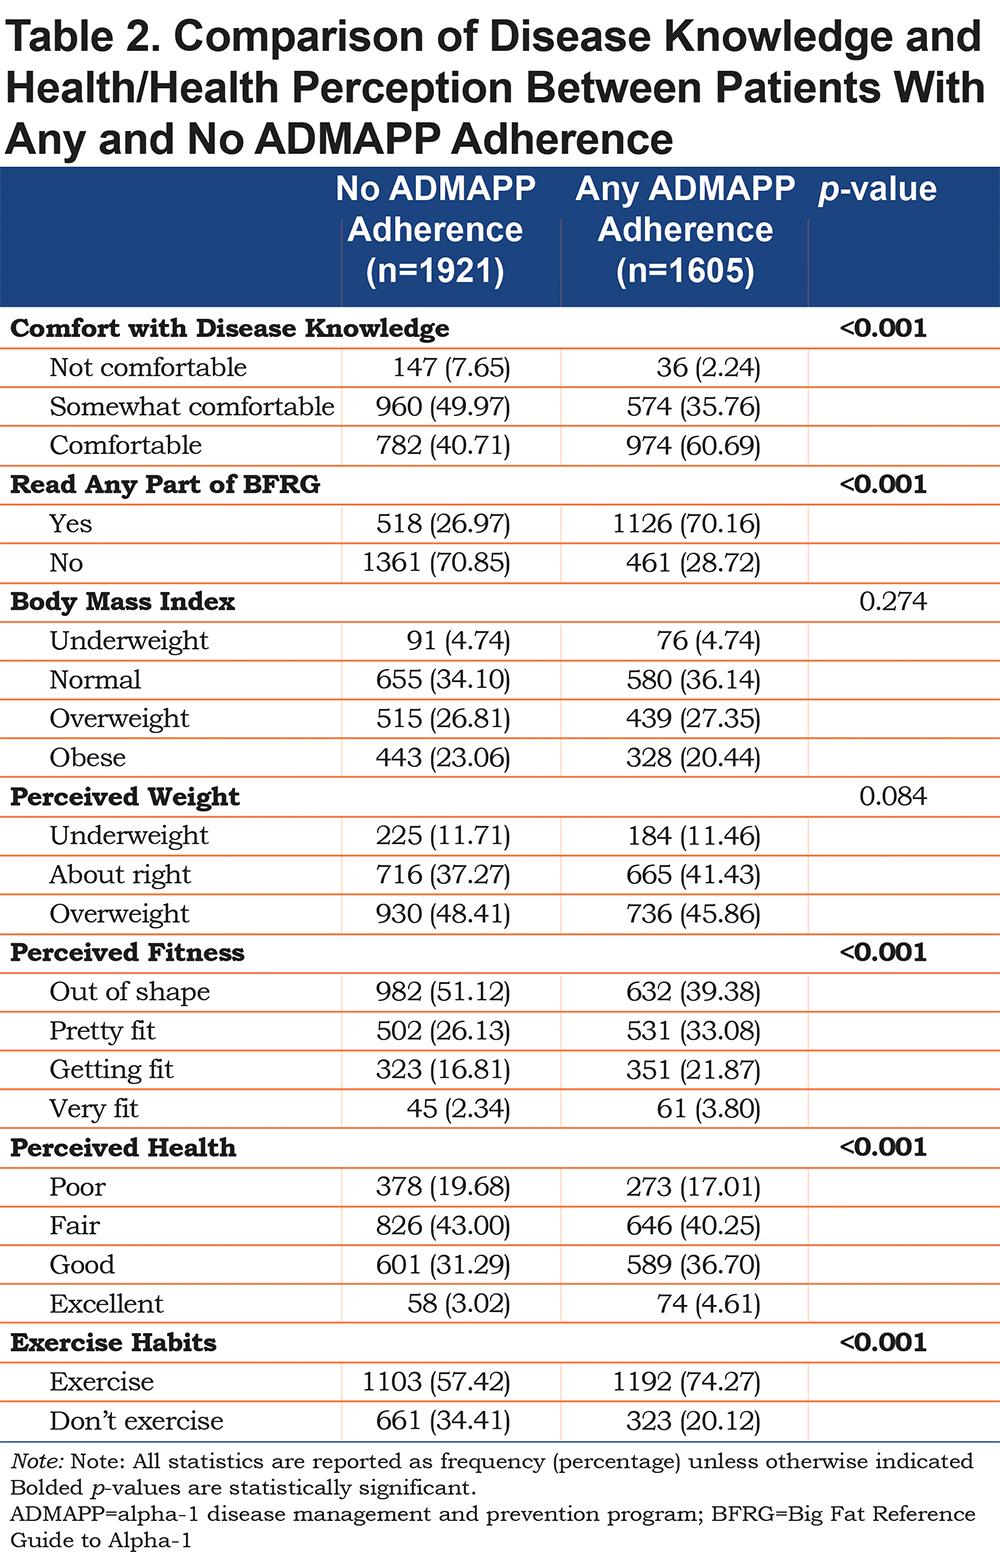 Disease Management Program for AATD Patients | Journal of